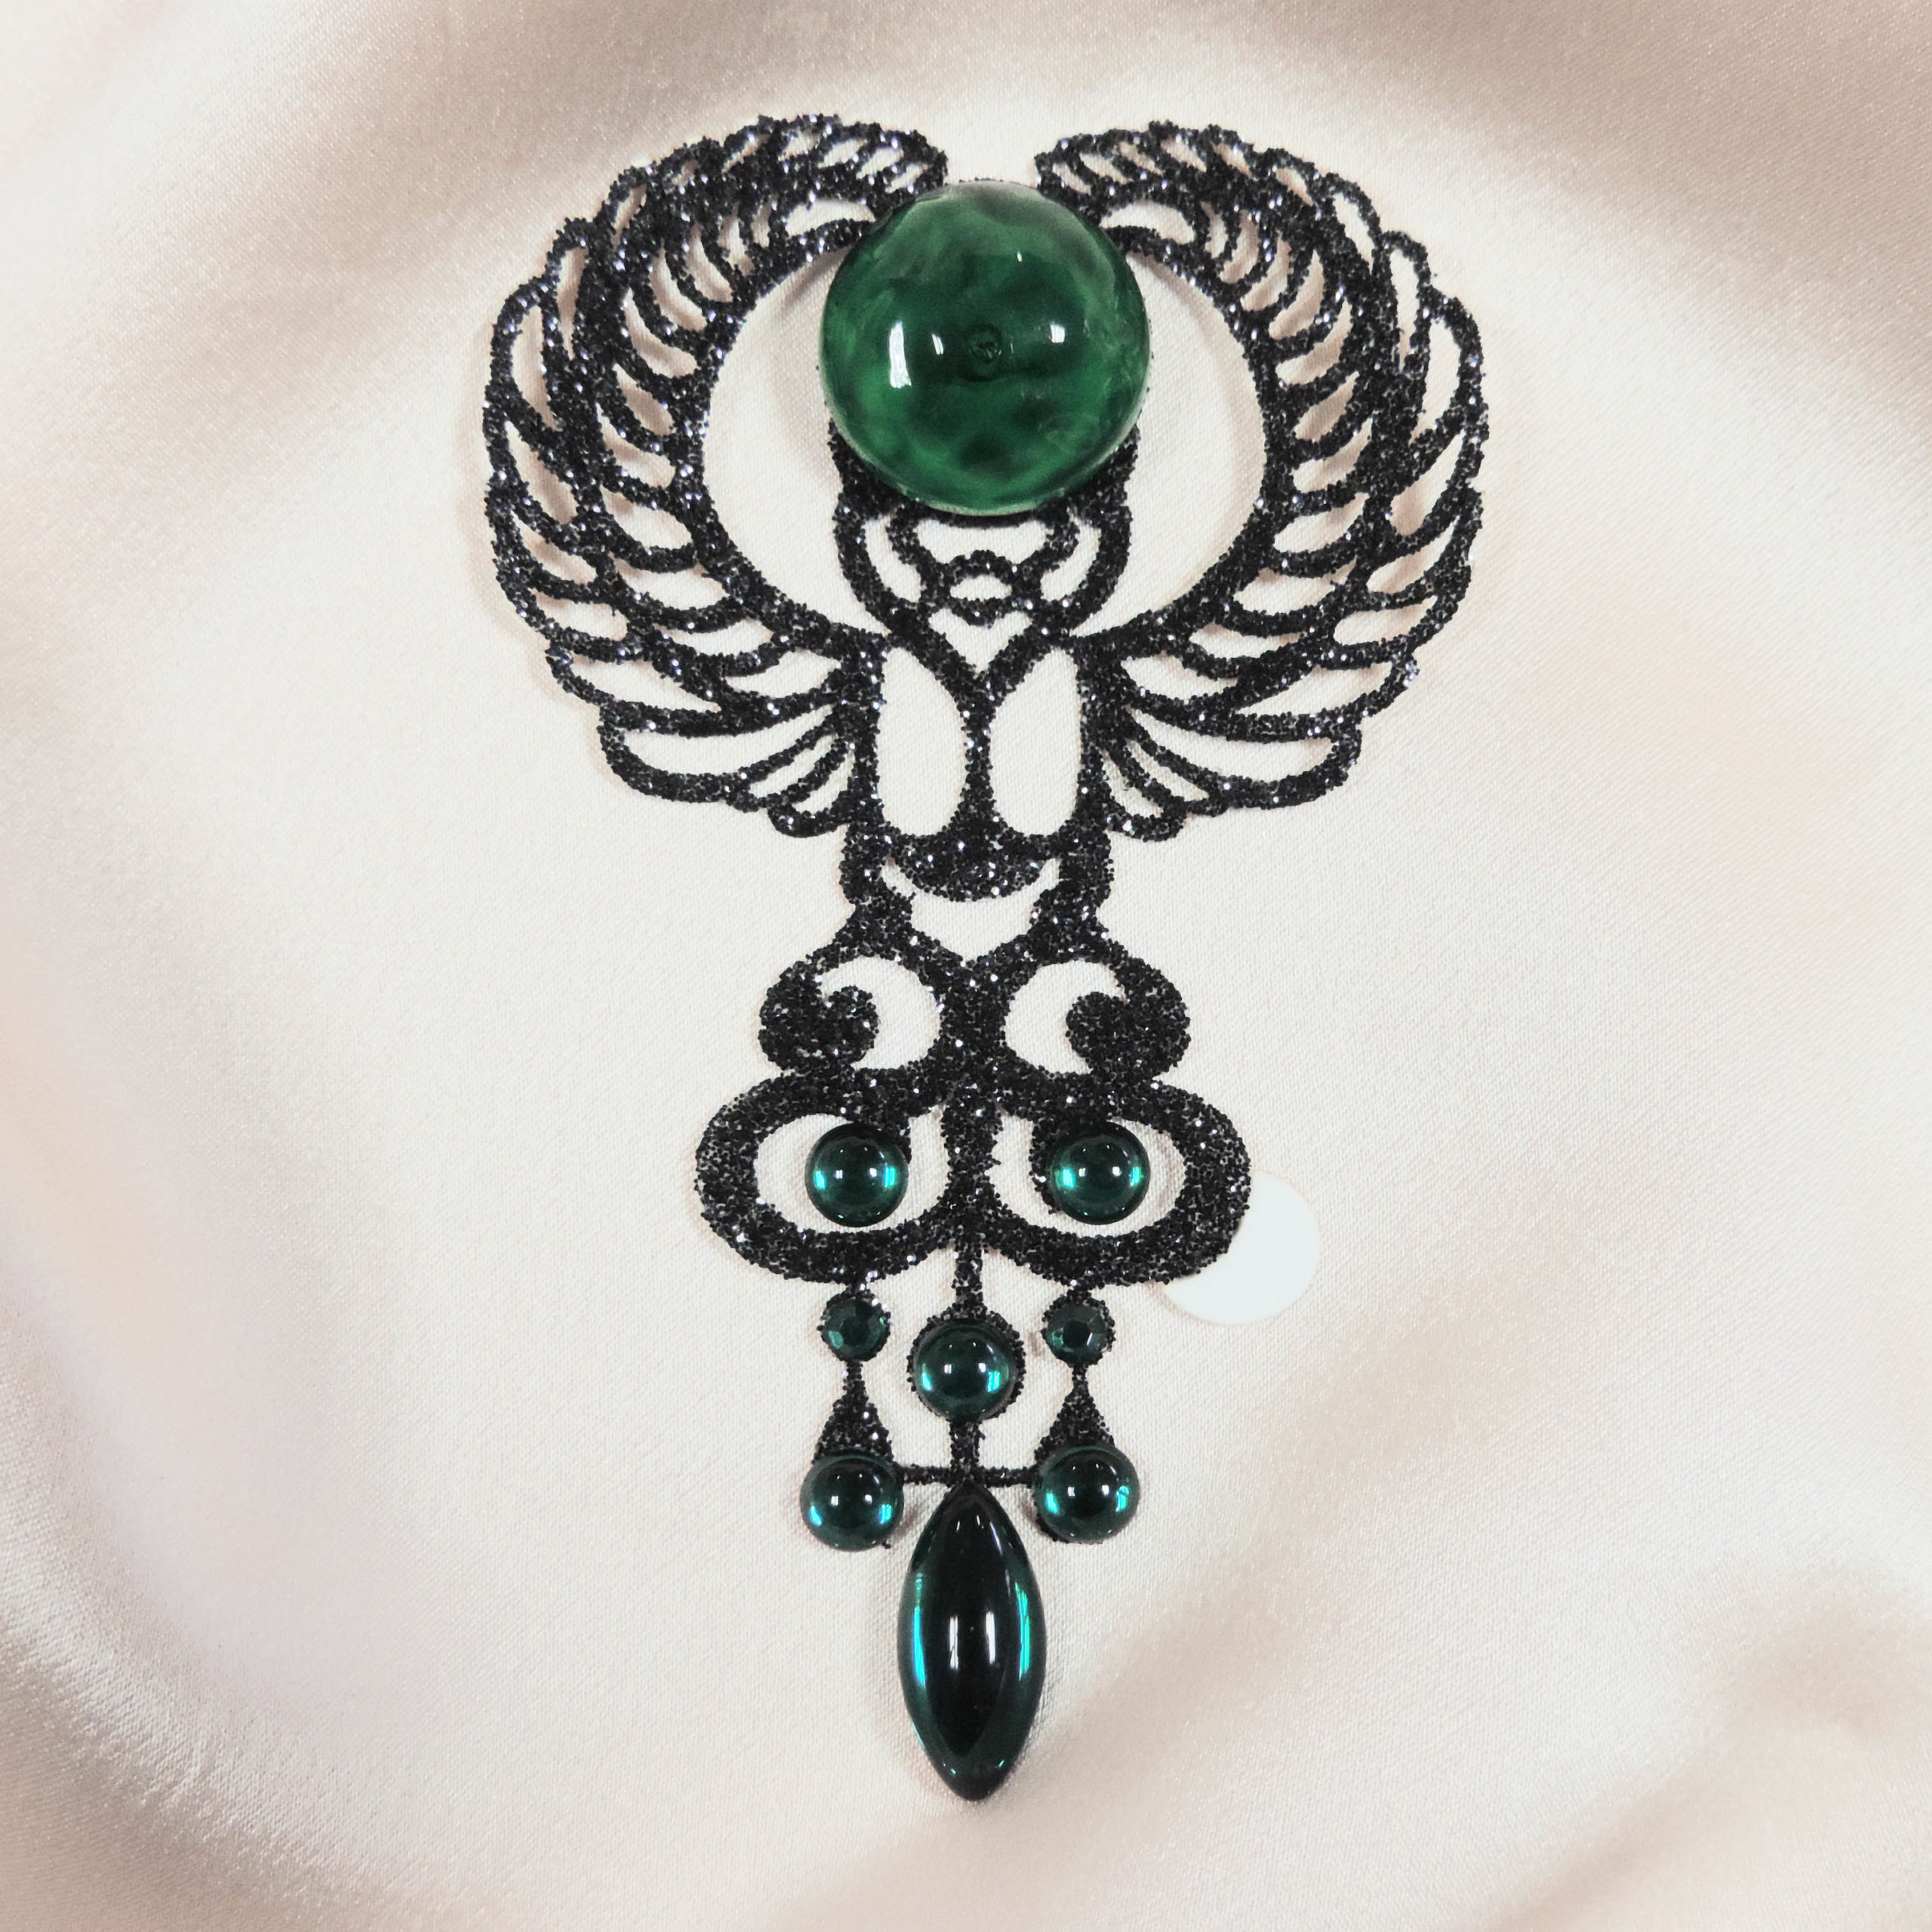 bijoux de peau animaux nefertiti noir fond satin